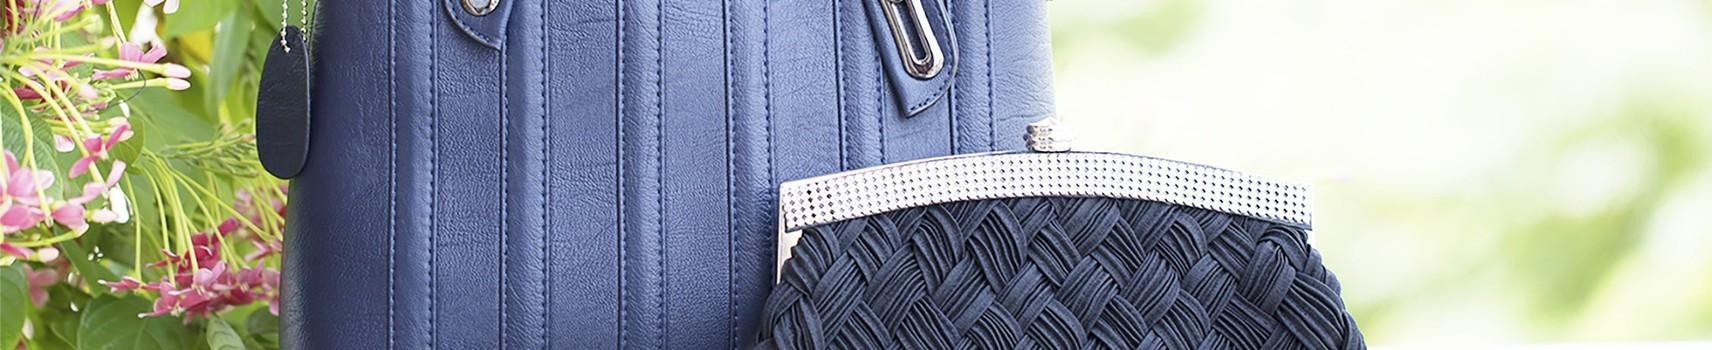 Women Bags | Pochette, Shoulder straps, Backpacks | AGEMINA Boutique